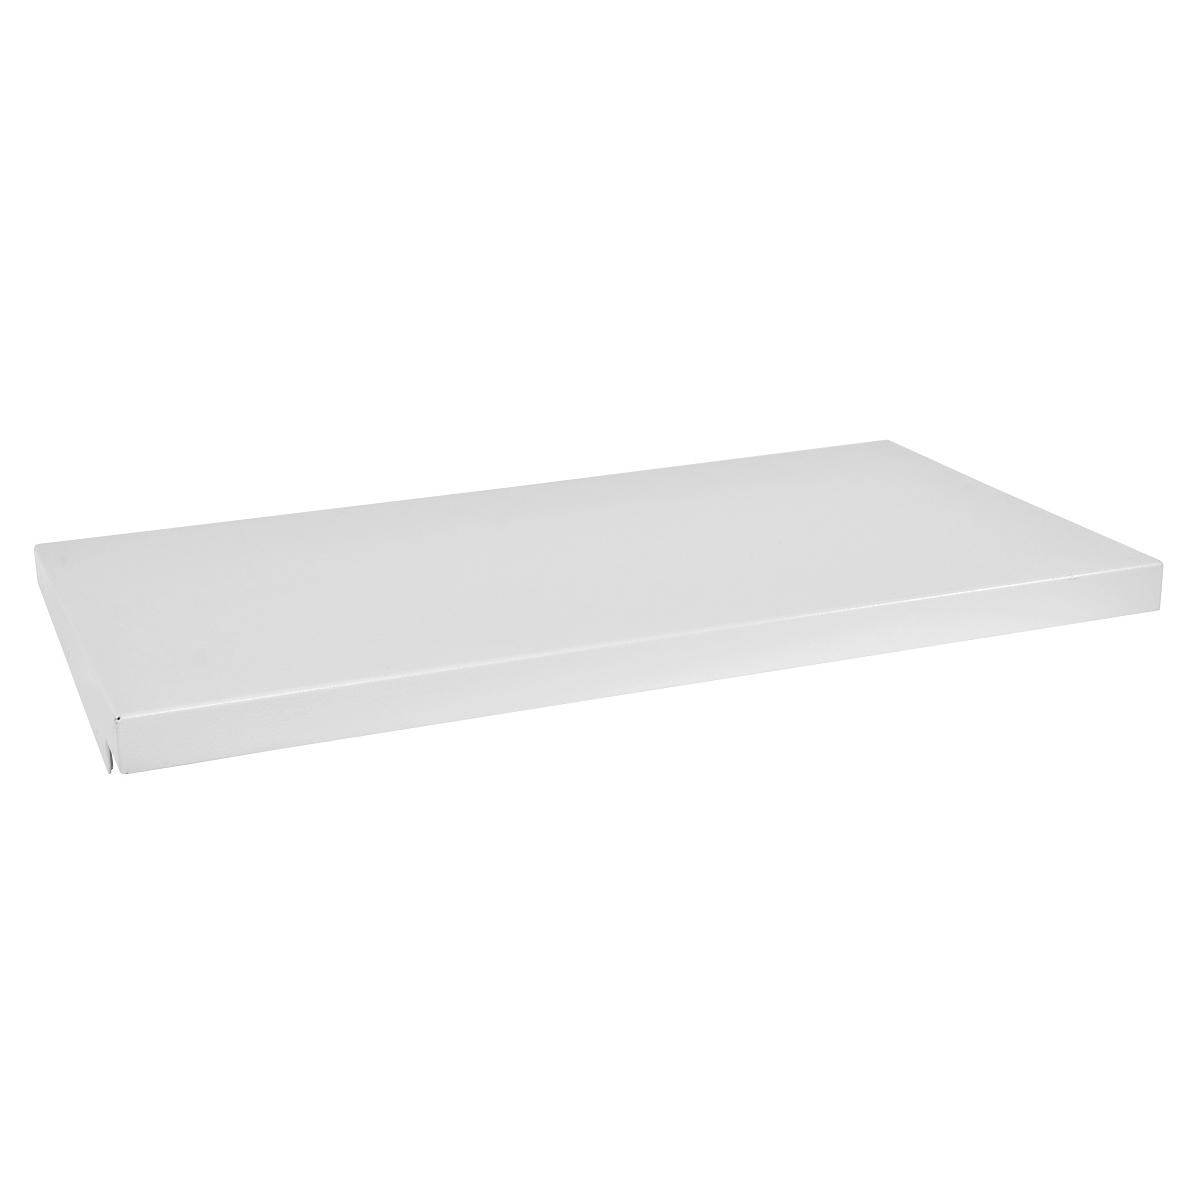 Оцинкованная крыша дождевая для шкафов ЦМО КД-ШТВ-Н-620.500